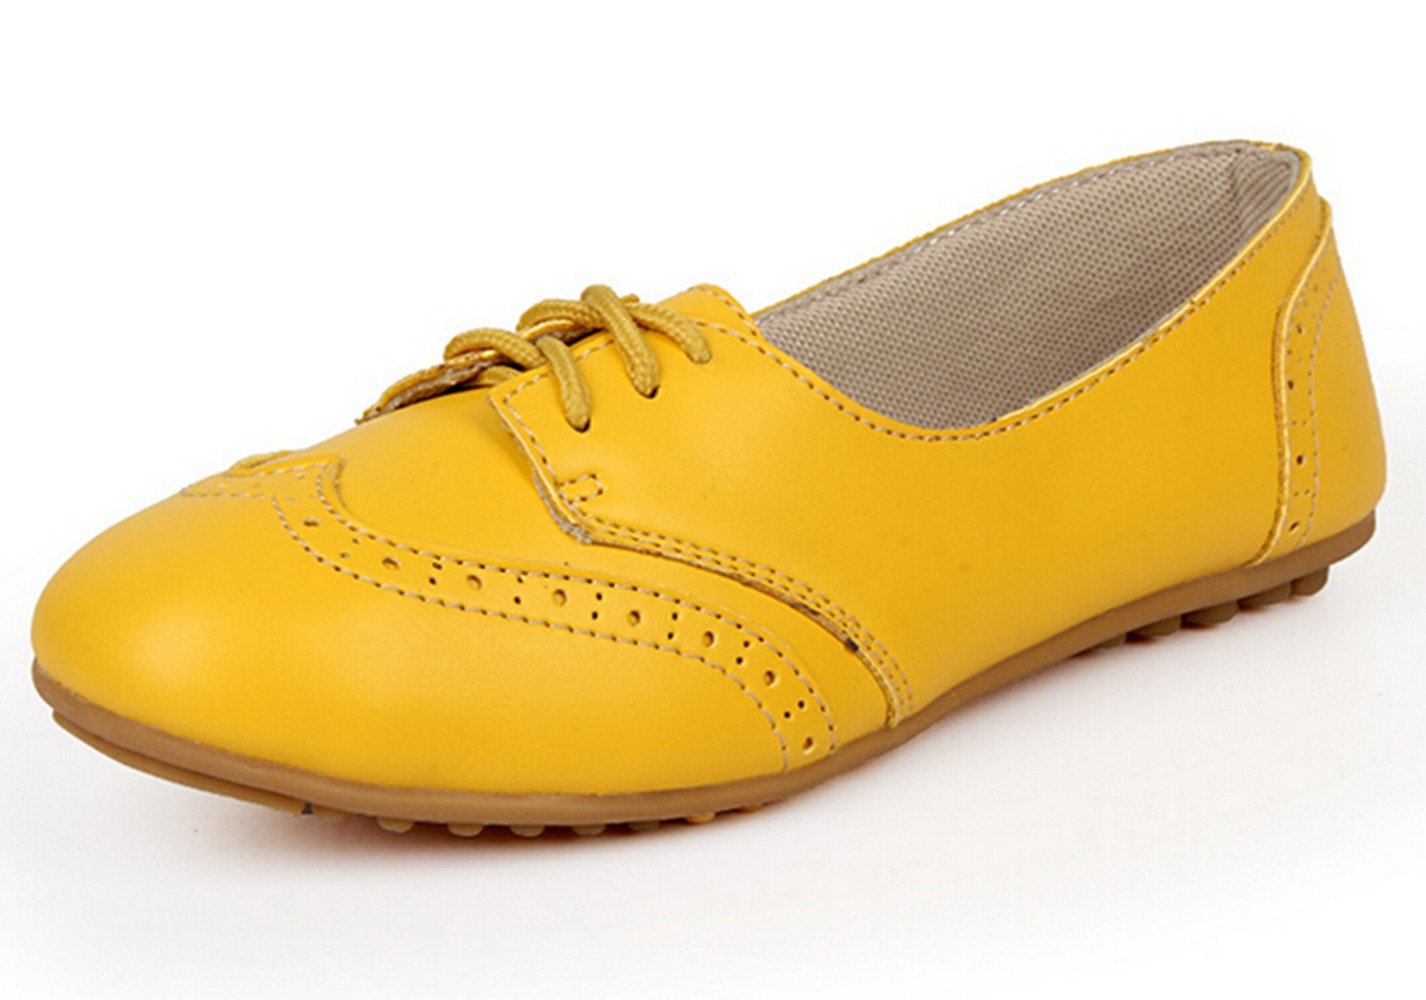 Bumud Women's Shoe Classic Lace Up Dress Low Heel Flat Oxford (8 M(B) US, Yellow)